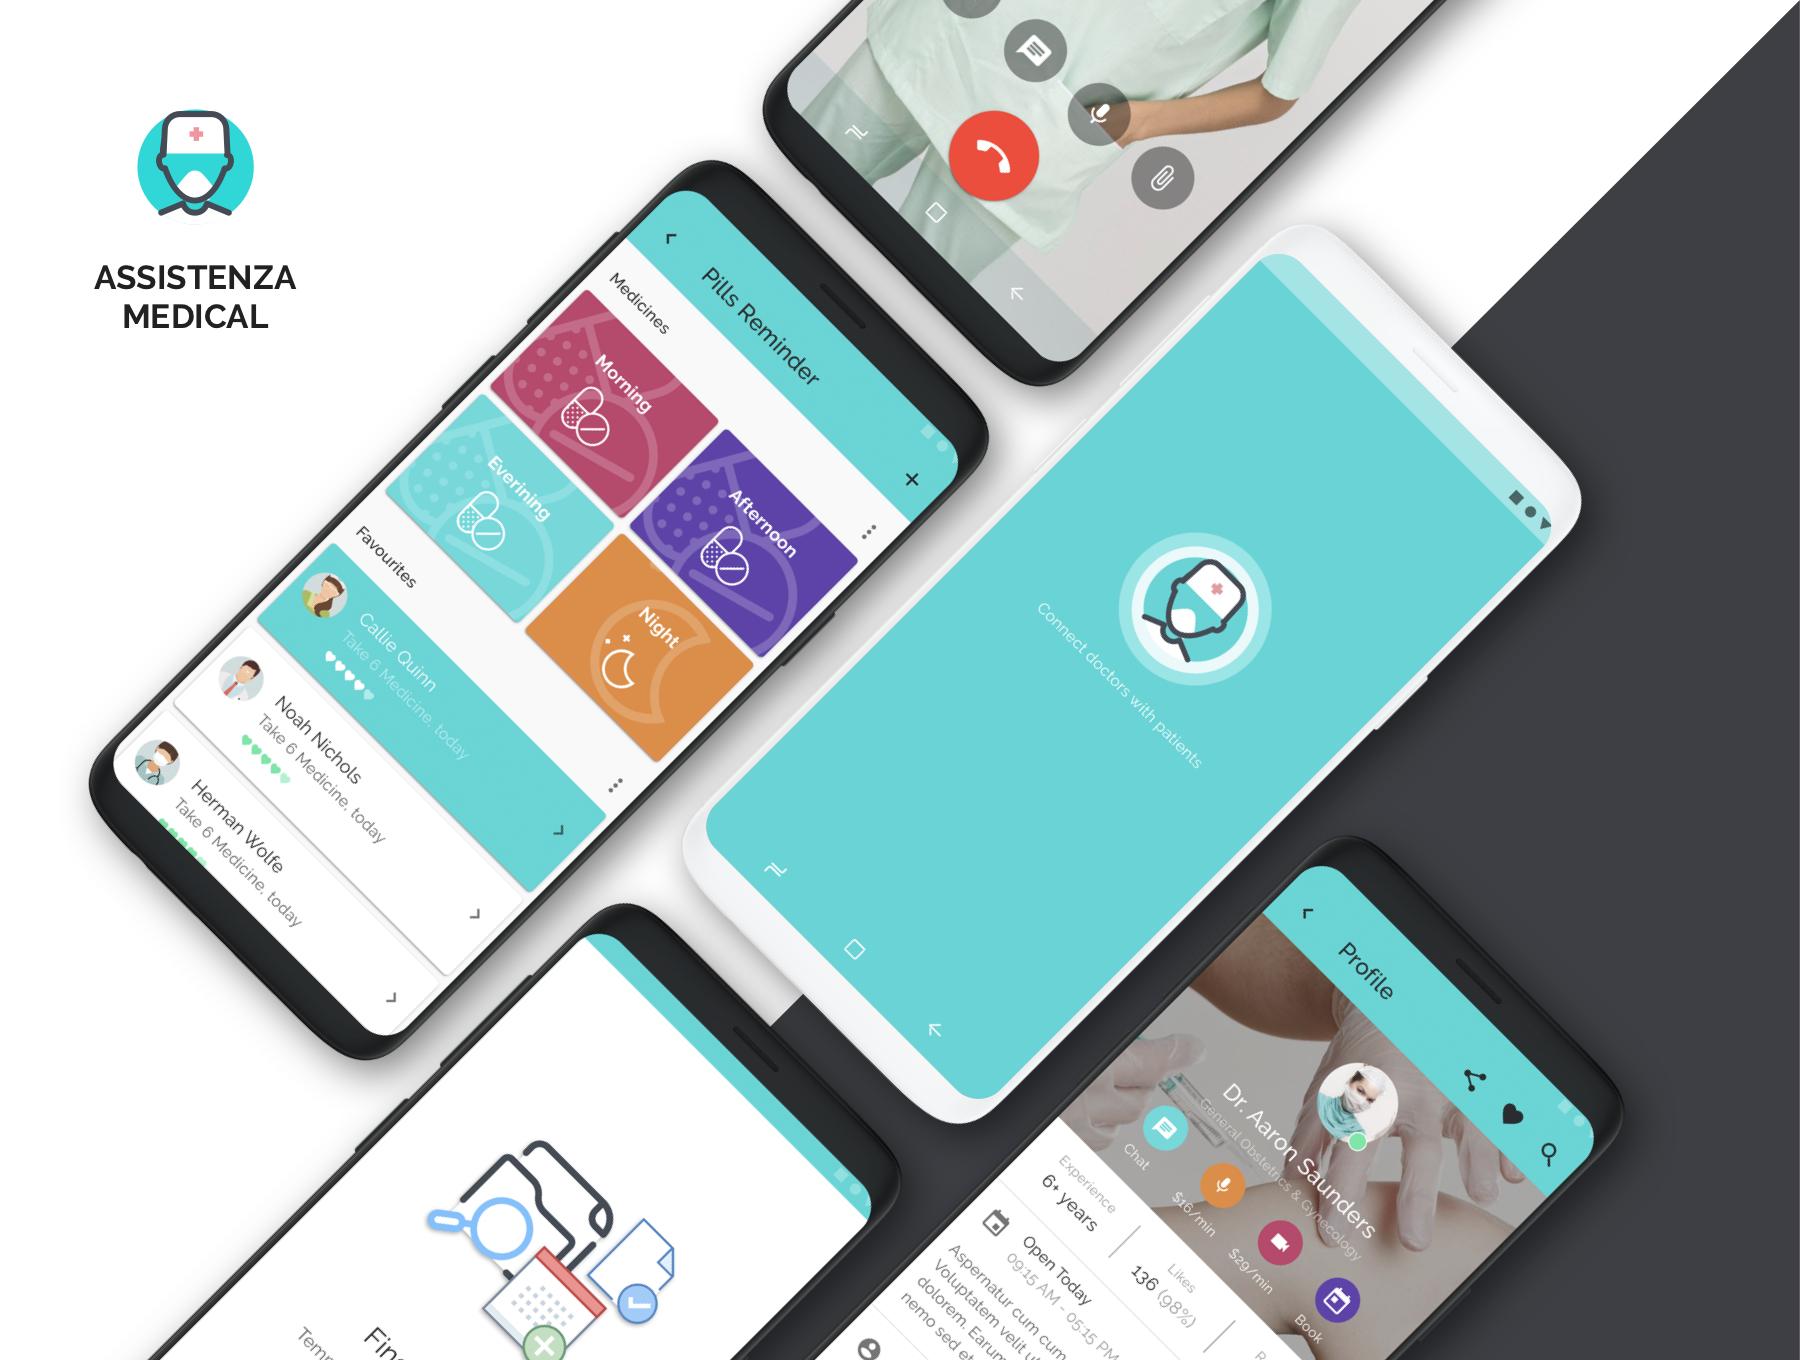 医疗功能的APP UI产品Android Ui安卓U ui素材下载[Sketch] Assistenza Medical